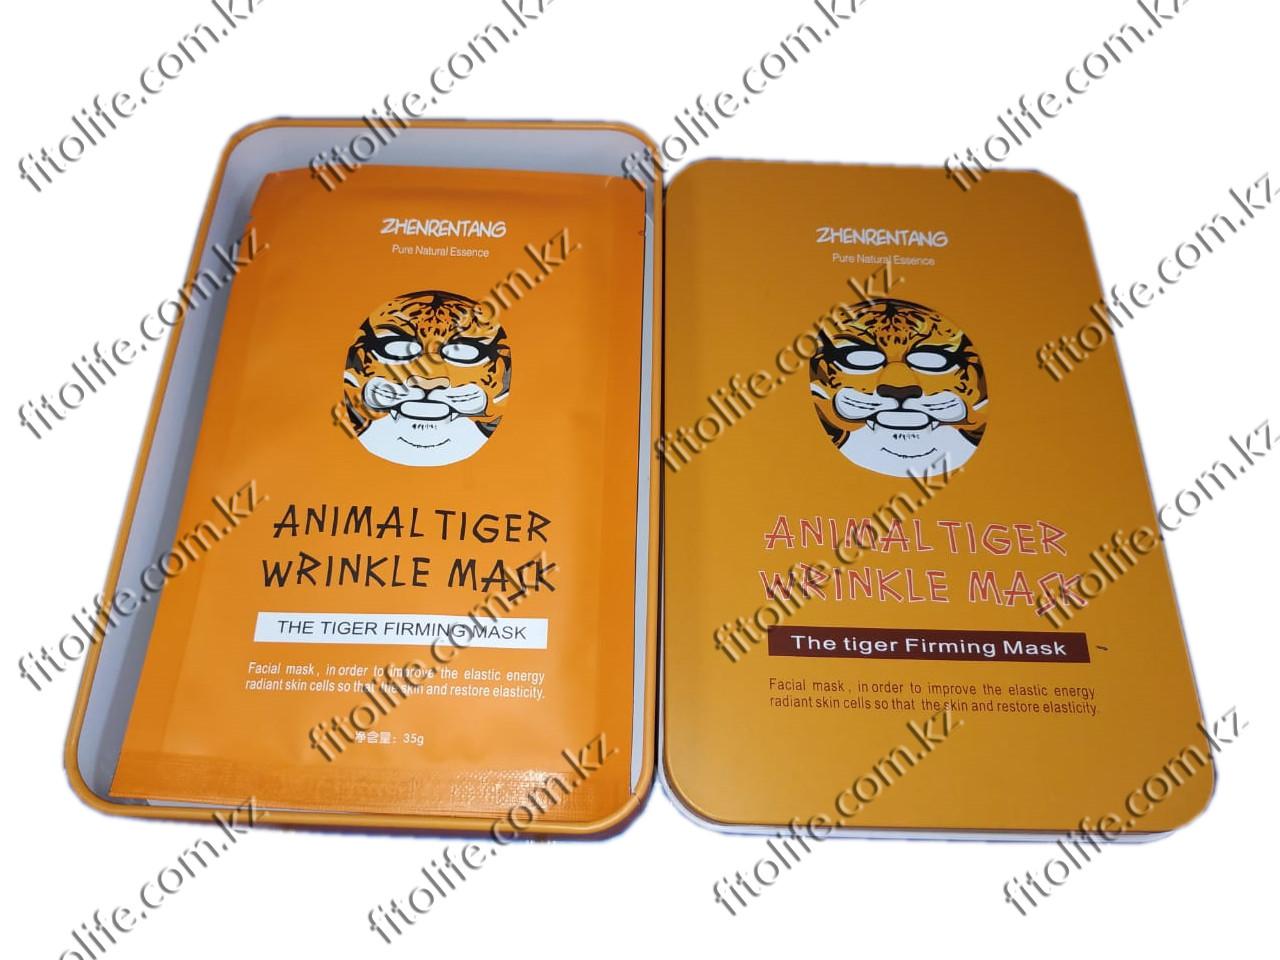 Animal Tiger Wrinkle Mask, Маска для лица от морщин